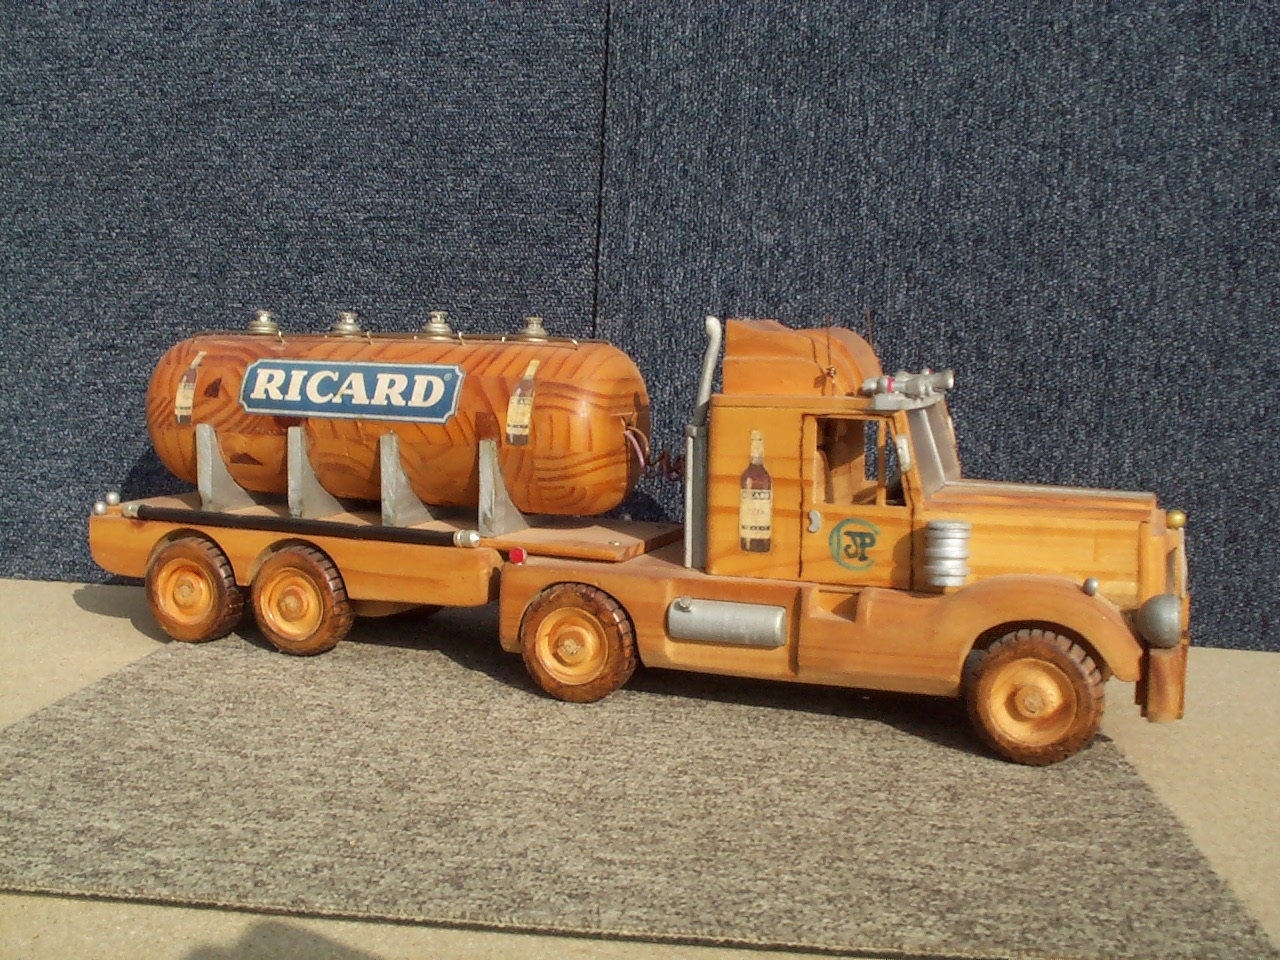 camions maquette en bois cabrera. Black Bedroom Furniture Sets. Home Design Ideas